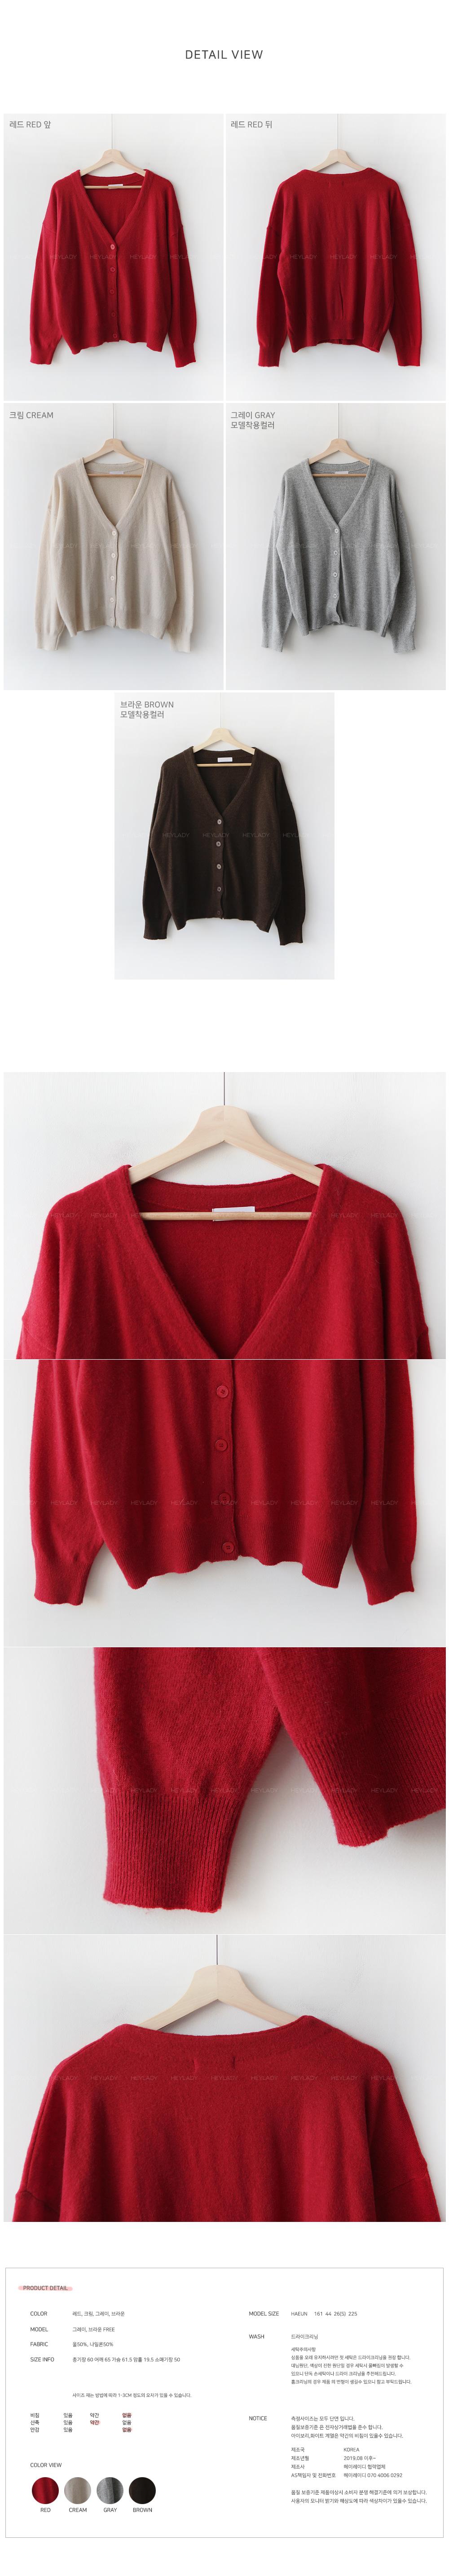 Loro wool knit cardigan